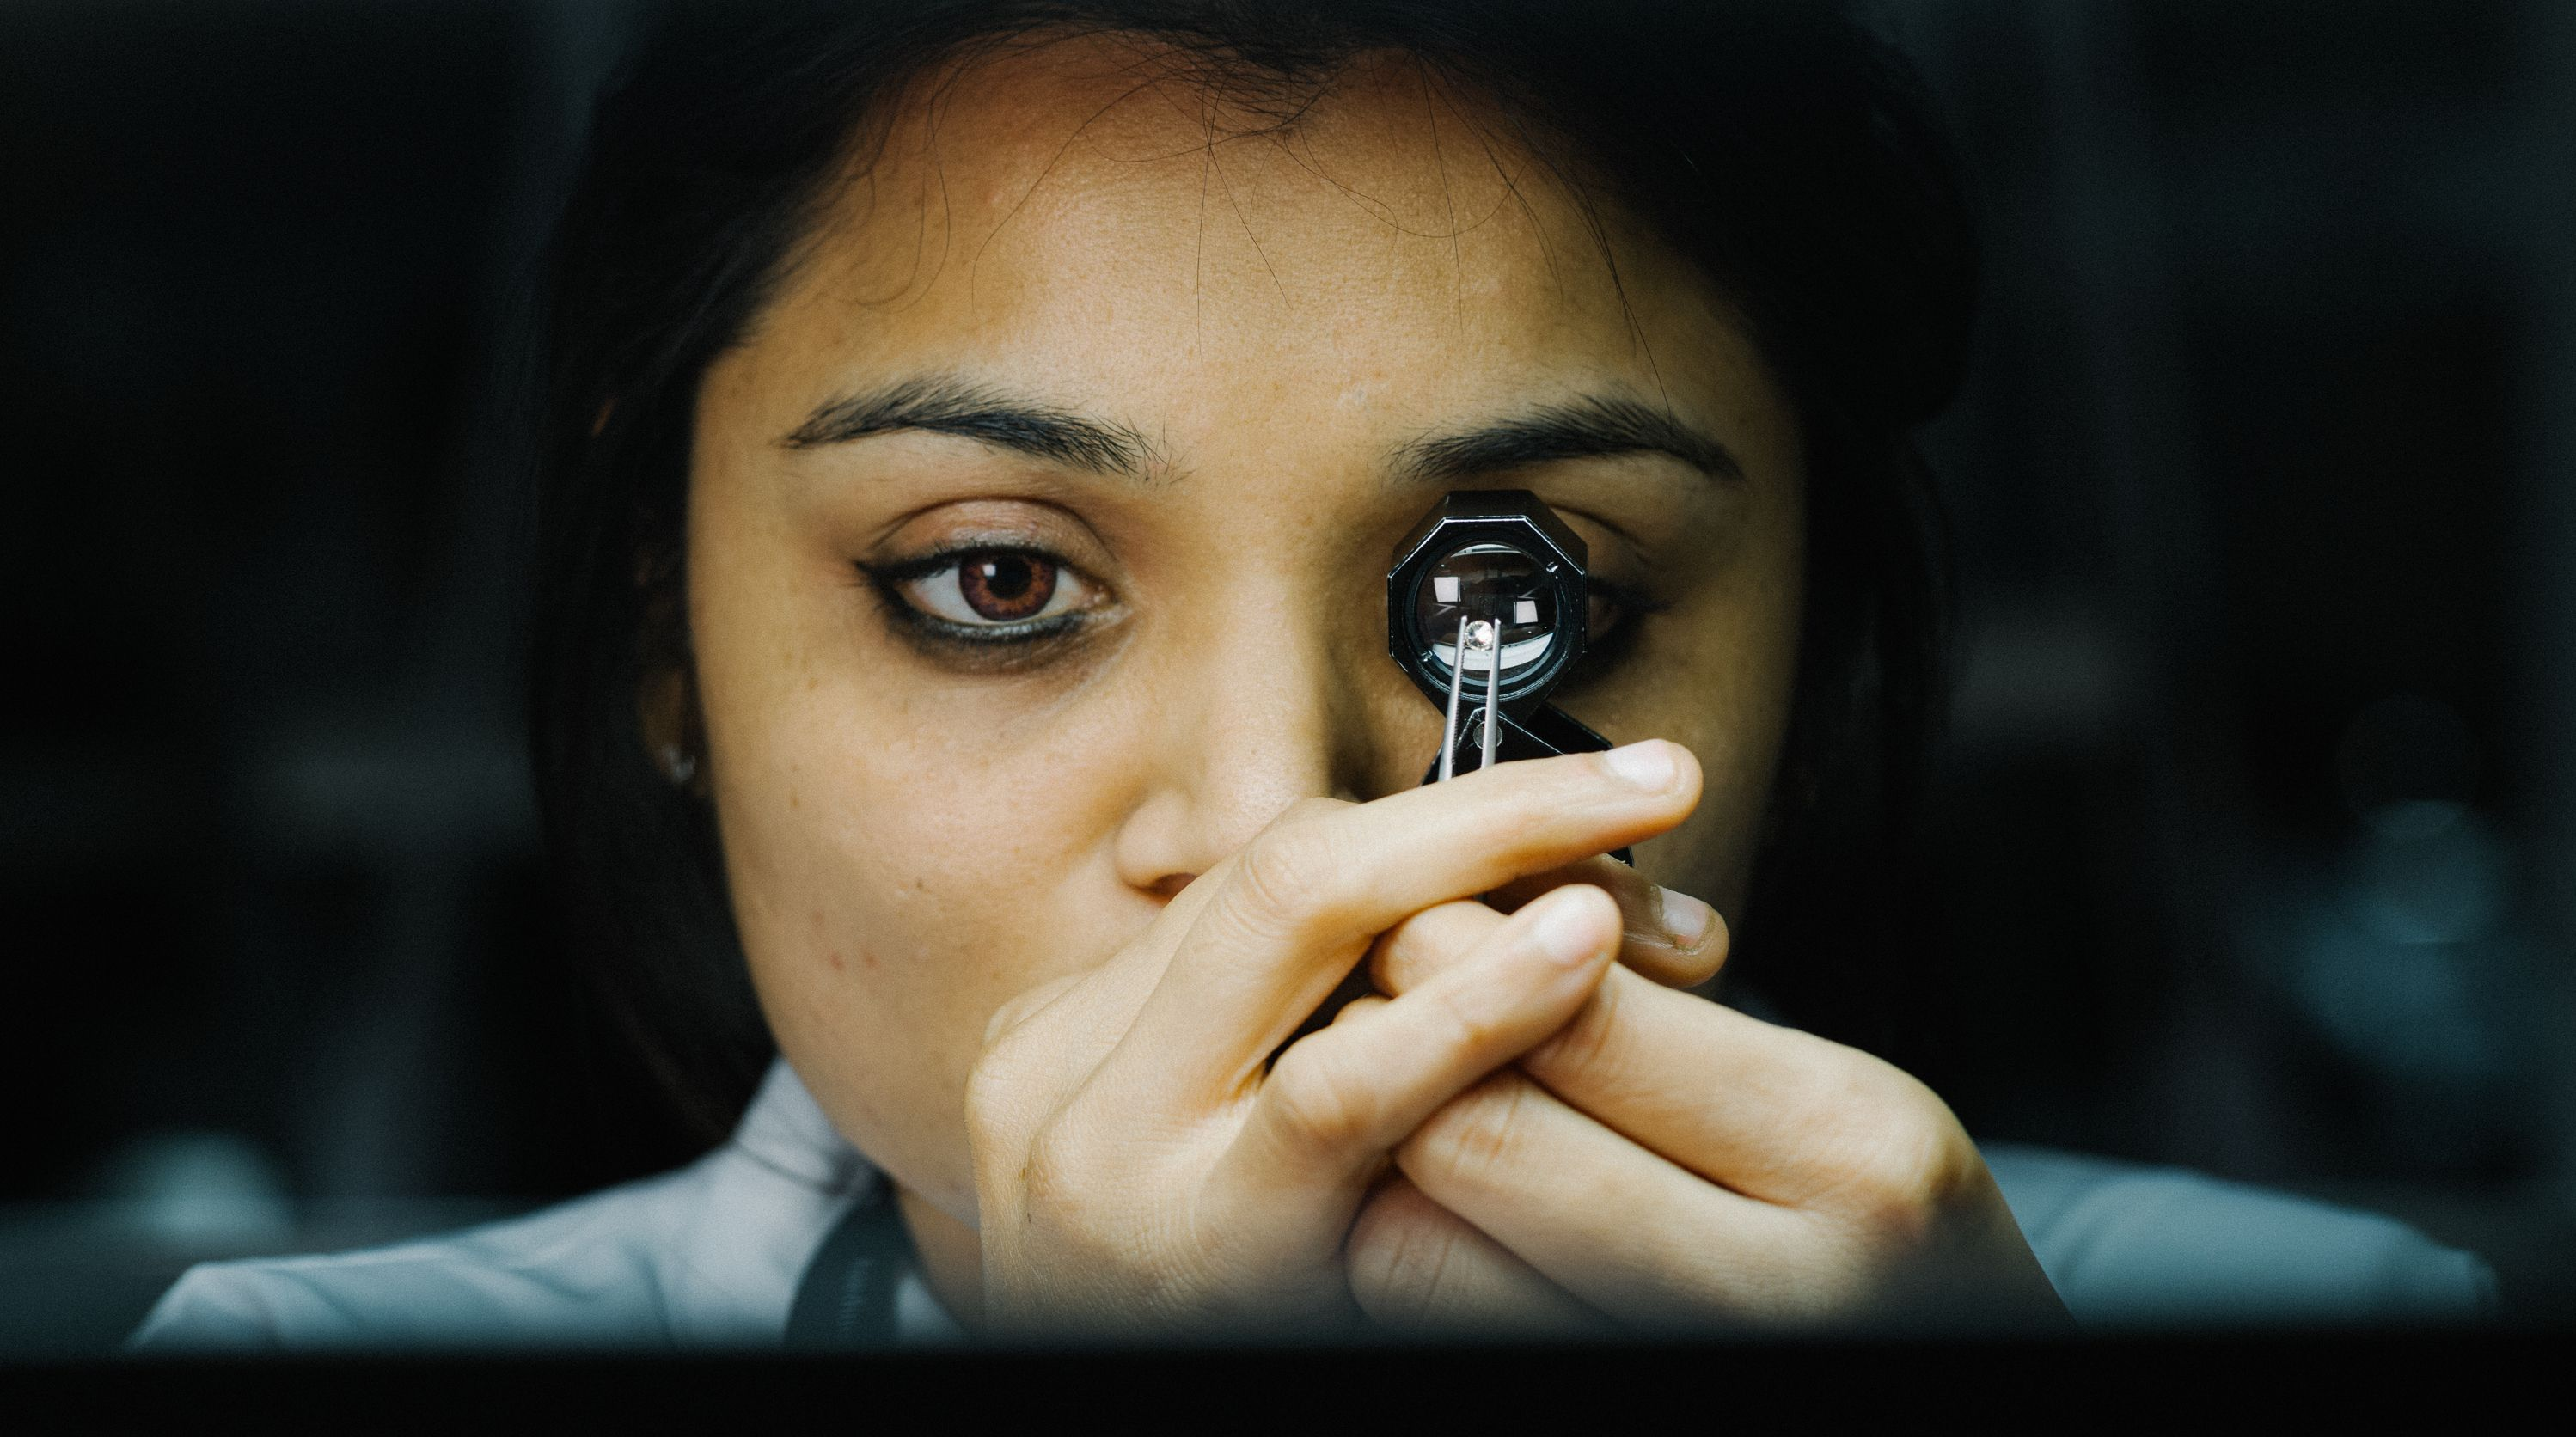 Woman examining a diamond